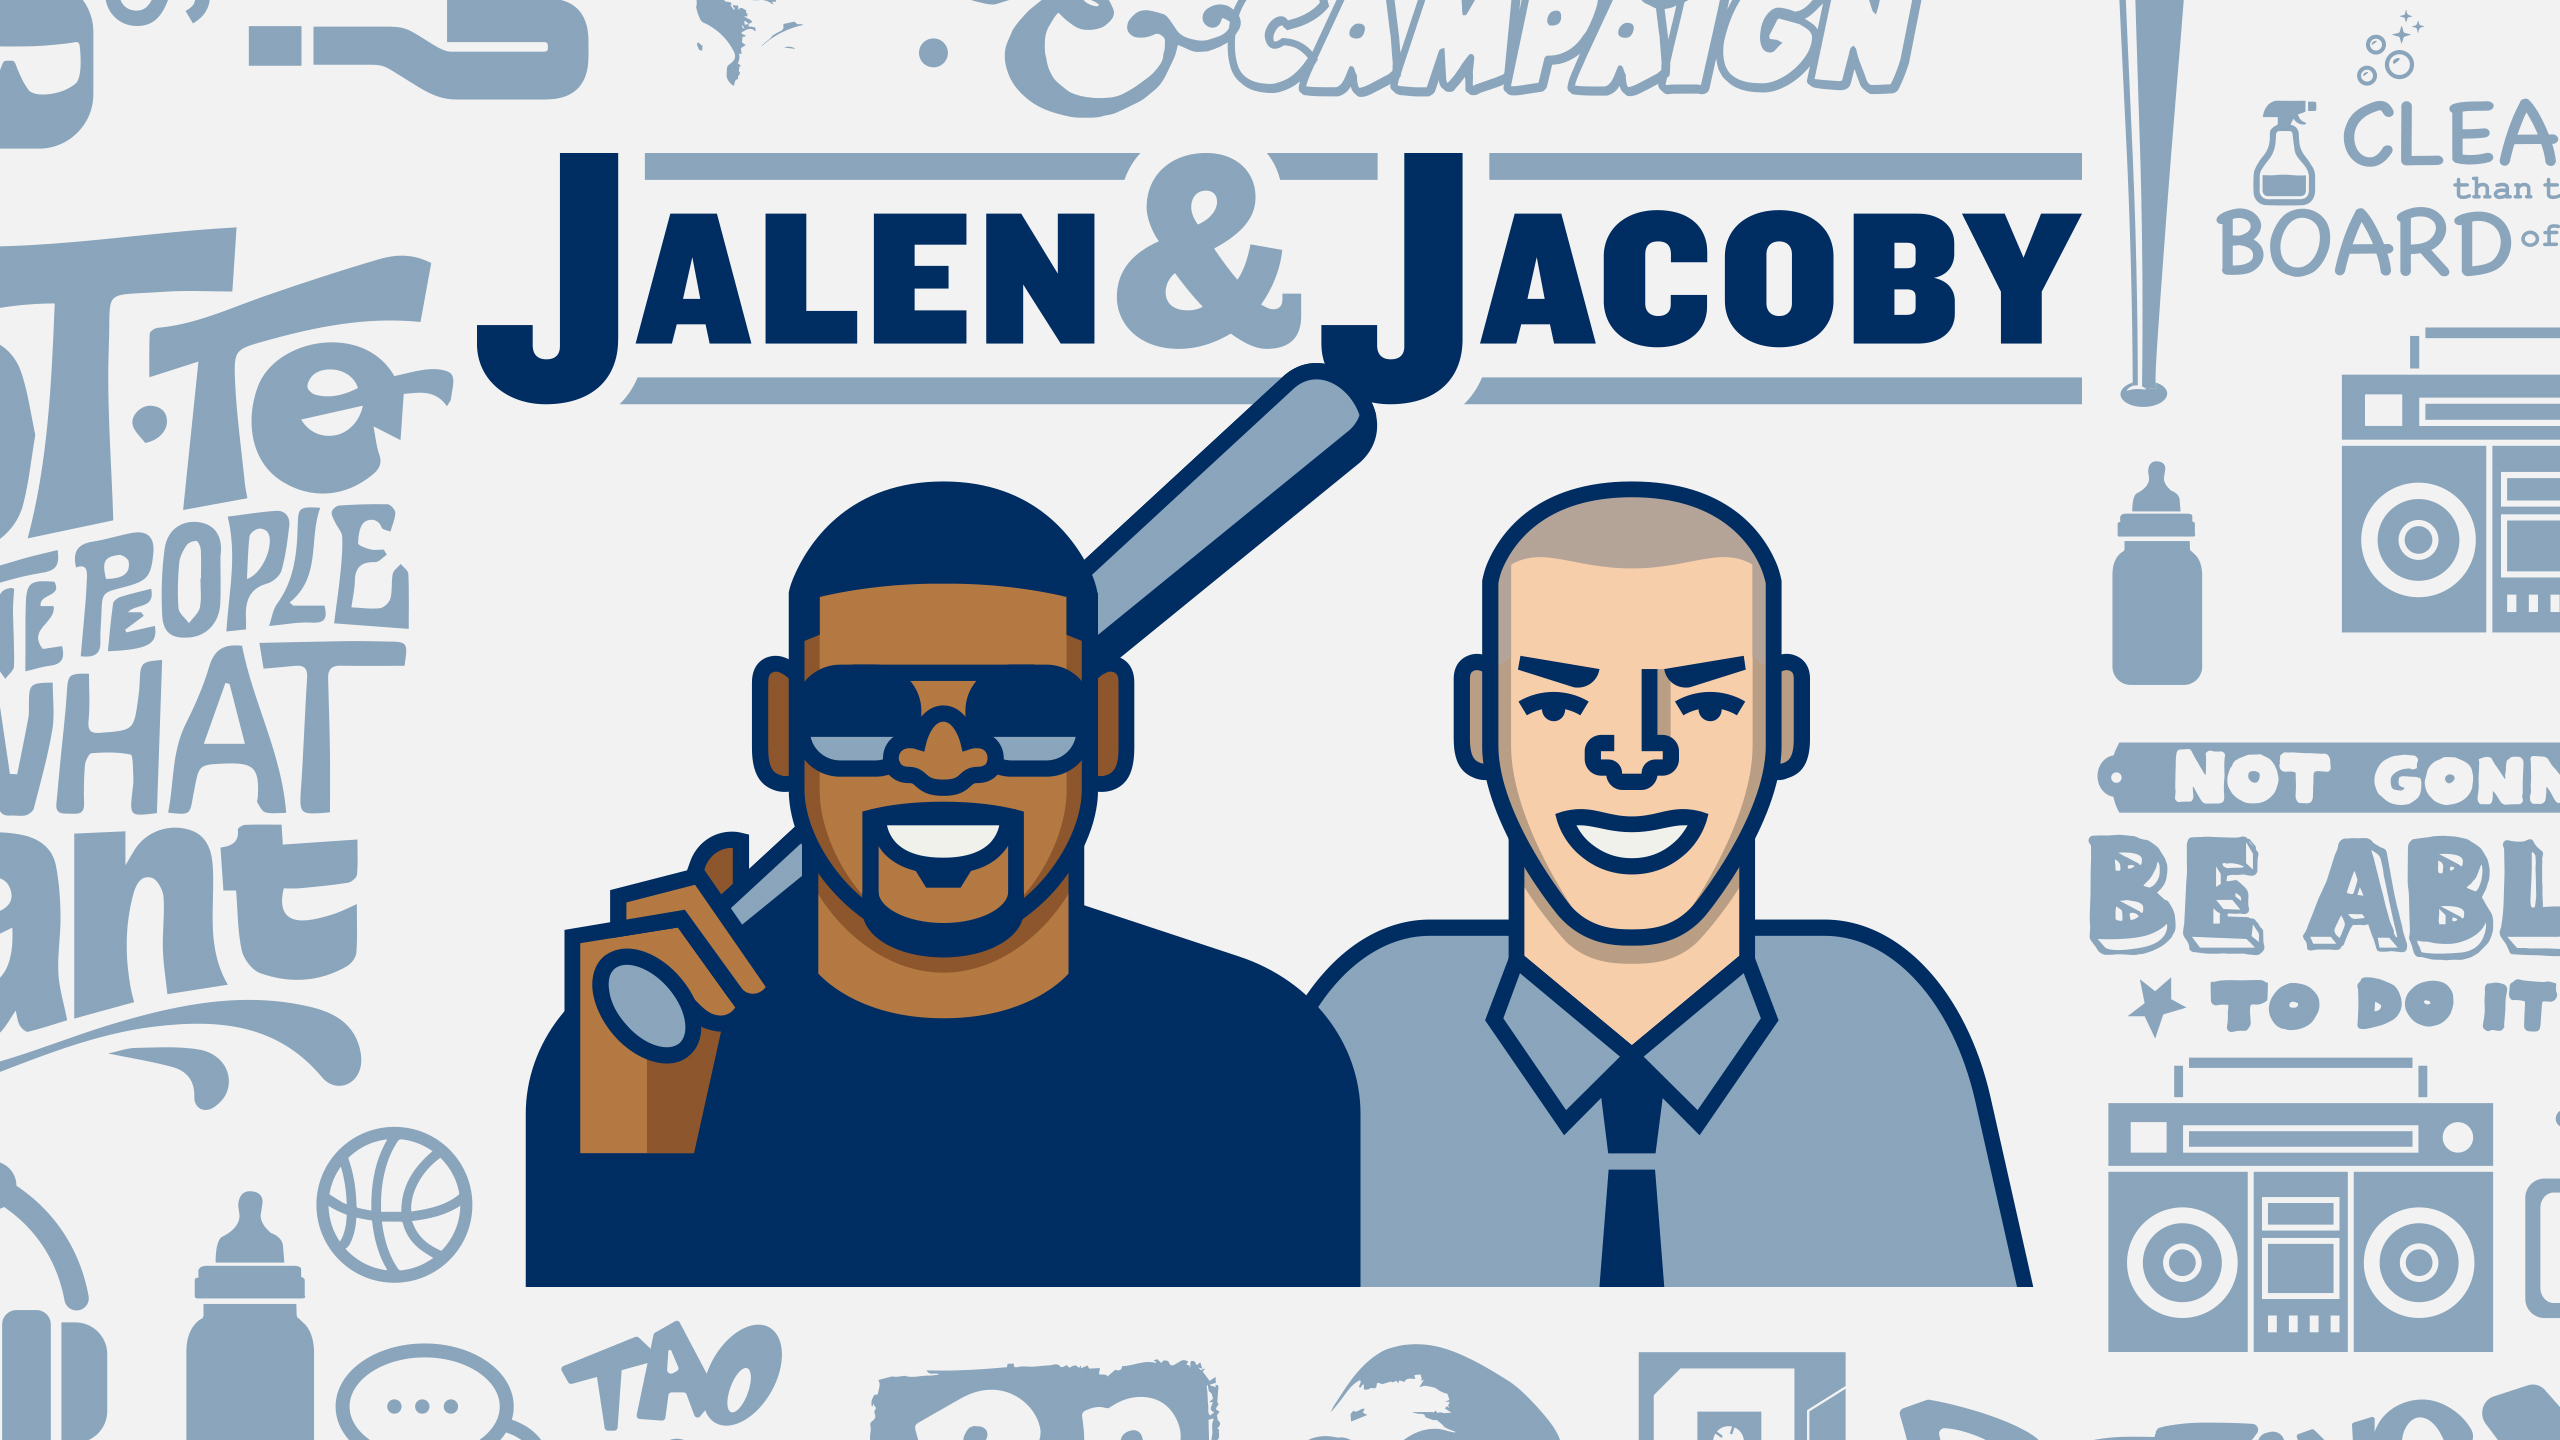 Mon, 12/10 - Jalen & Jacoby